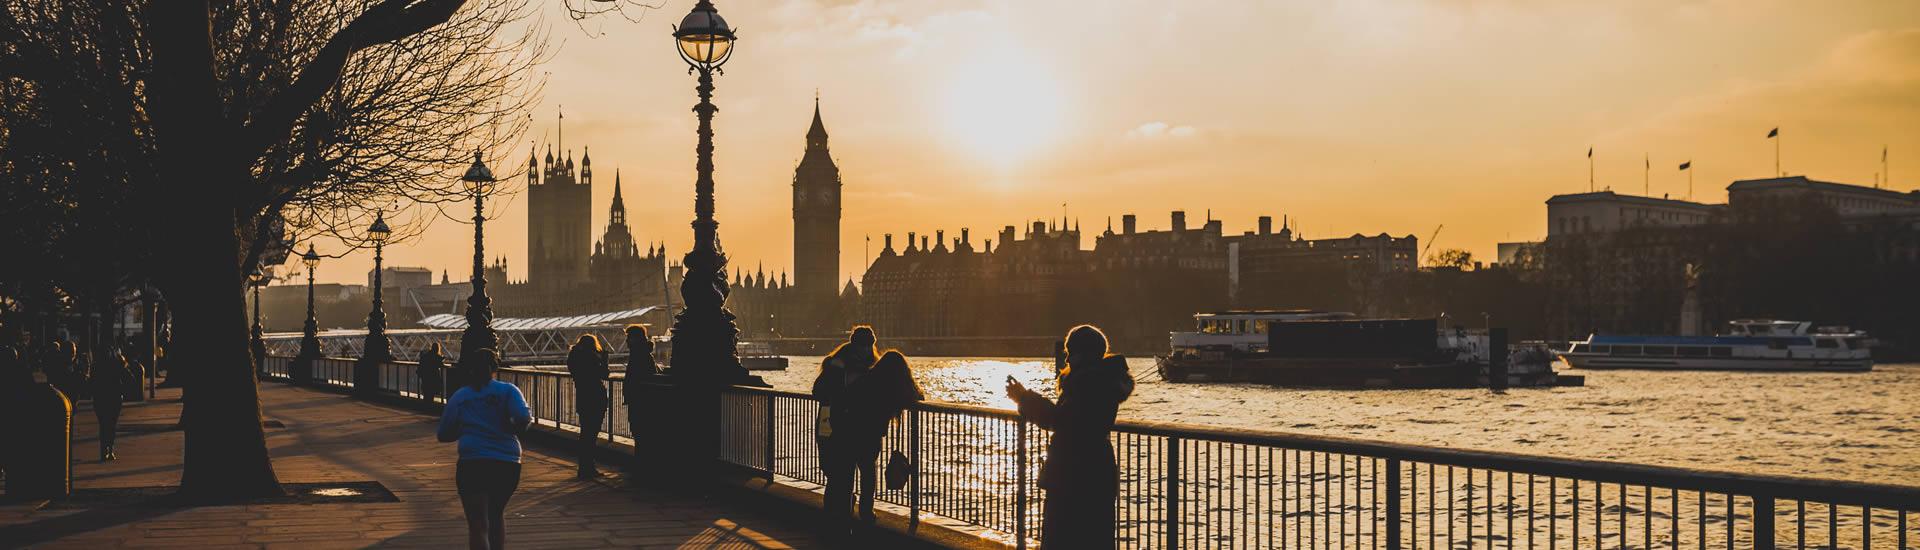 property match london